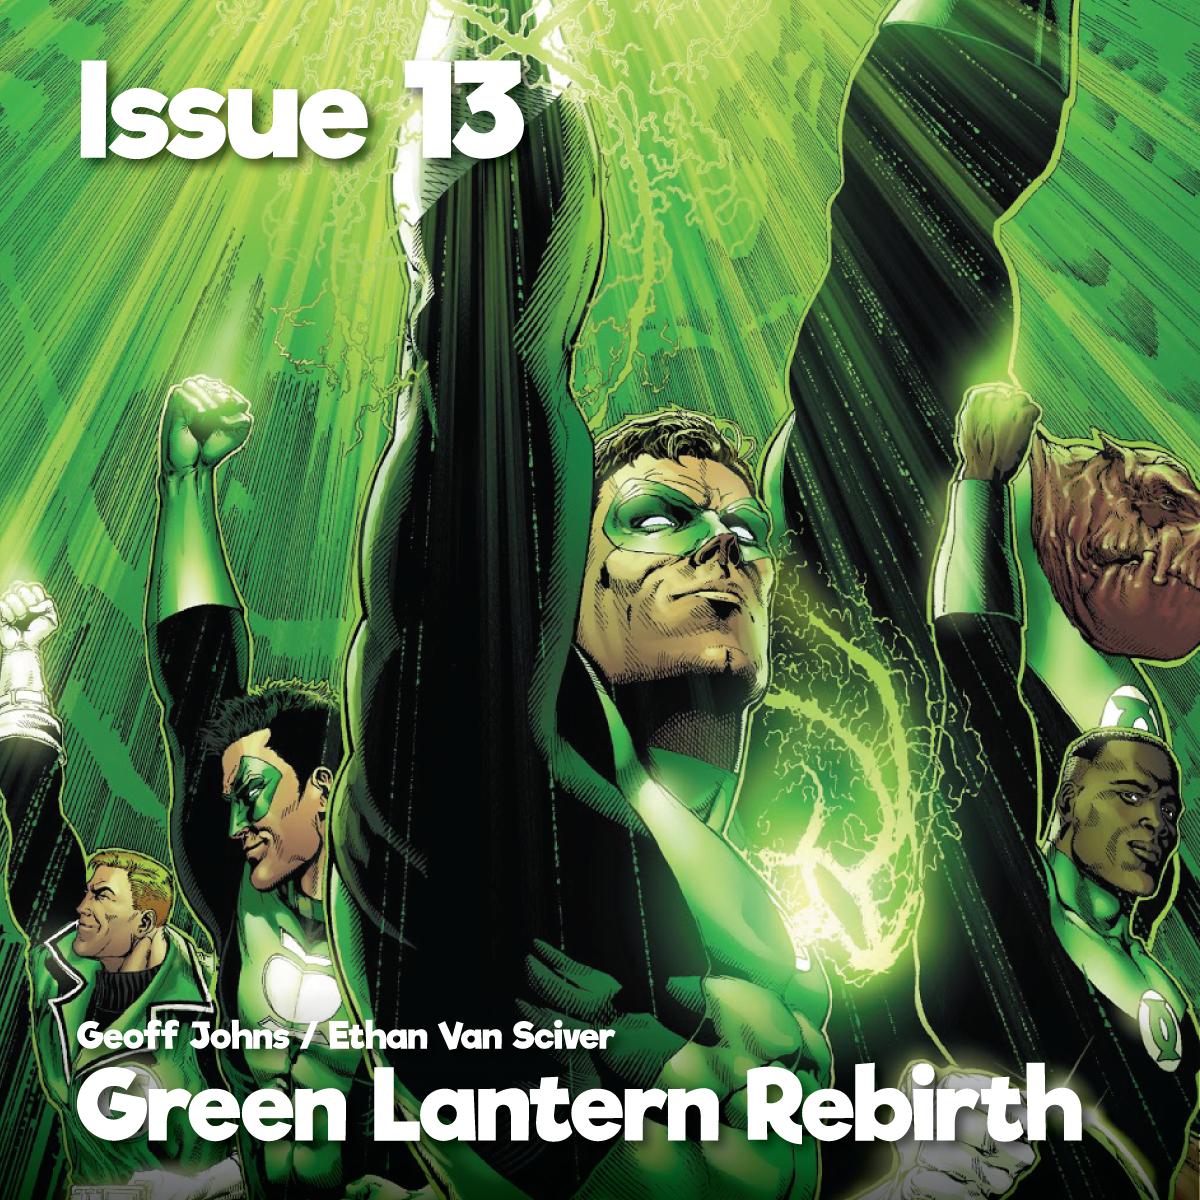 Issue13_GreenLanternRebirth_1200x1200.png